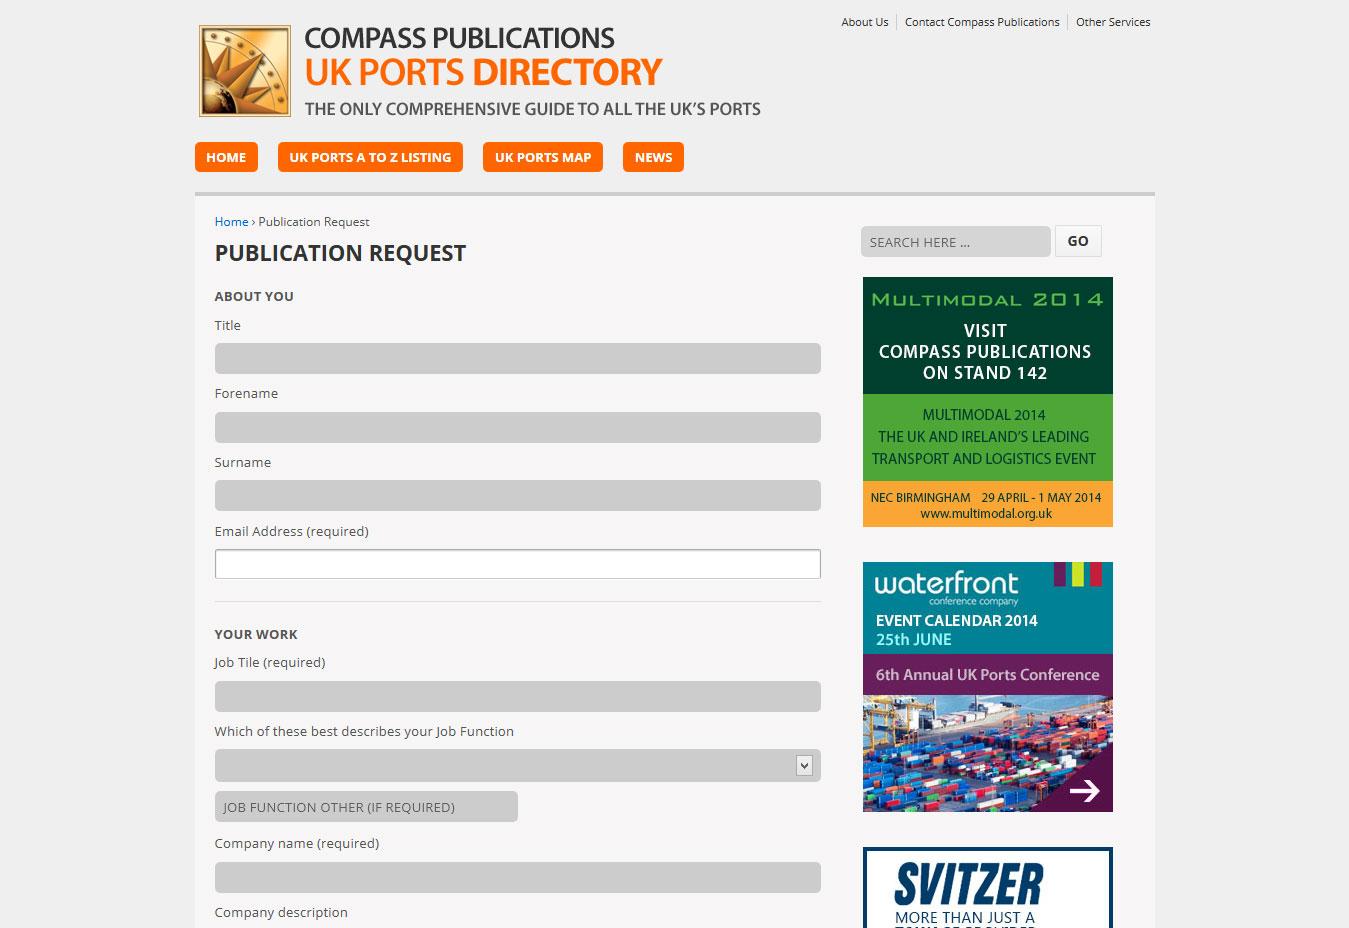 UK Ports Directory - Compass Publications